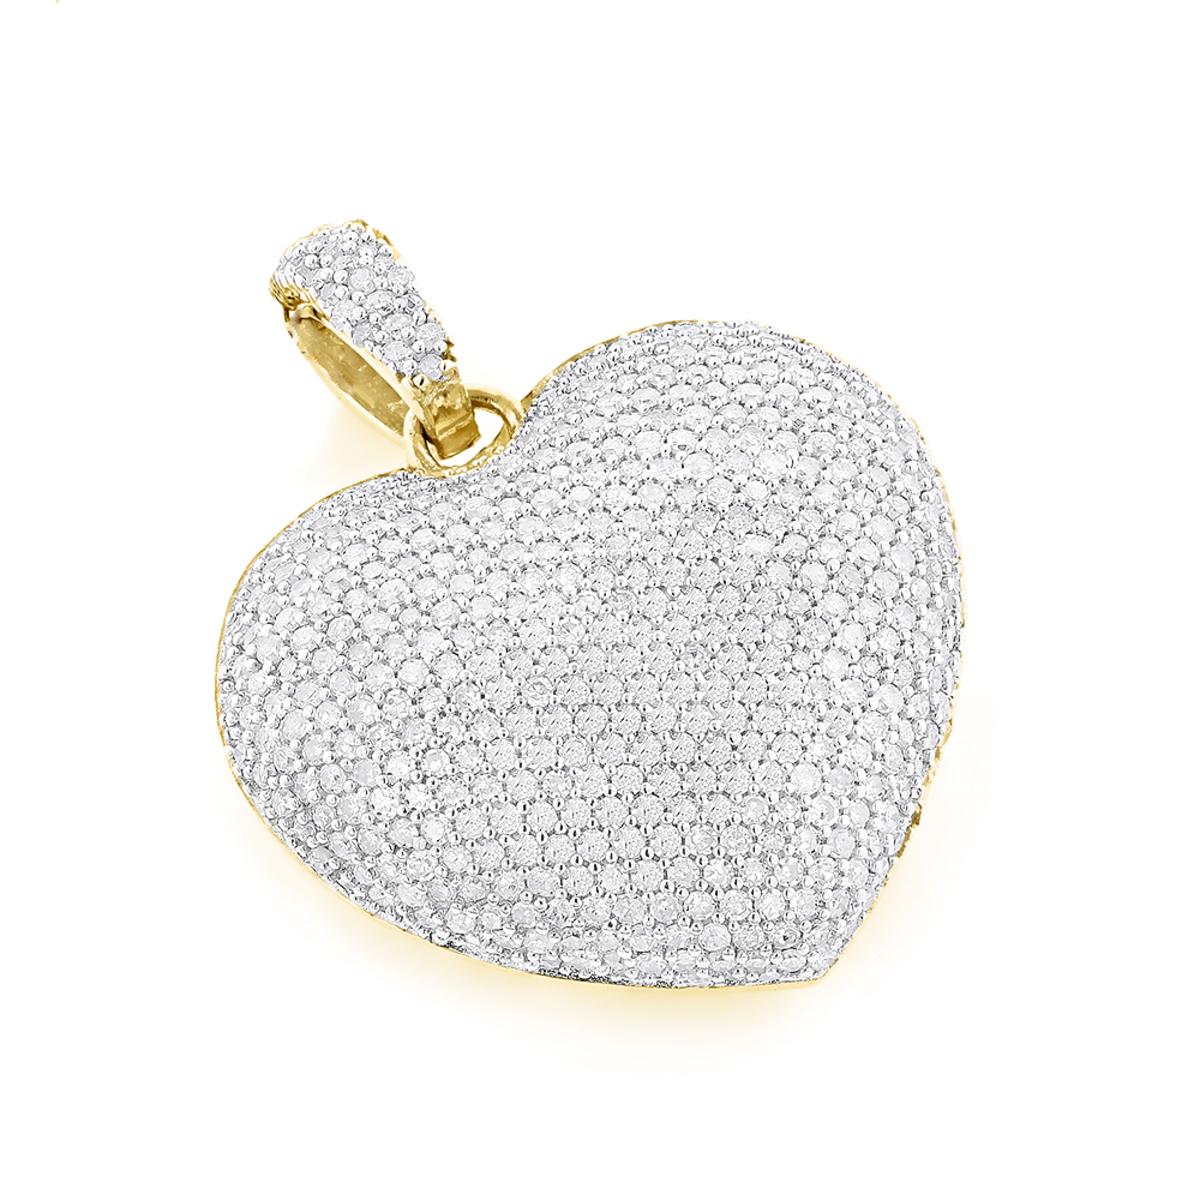 Pave Diamond Heart Pendant 14K Gold 2 carats